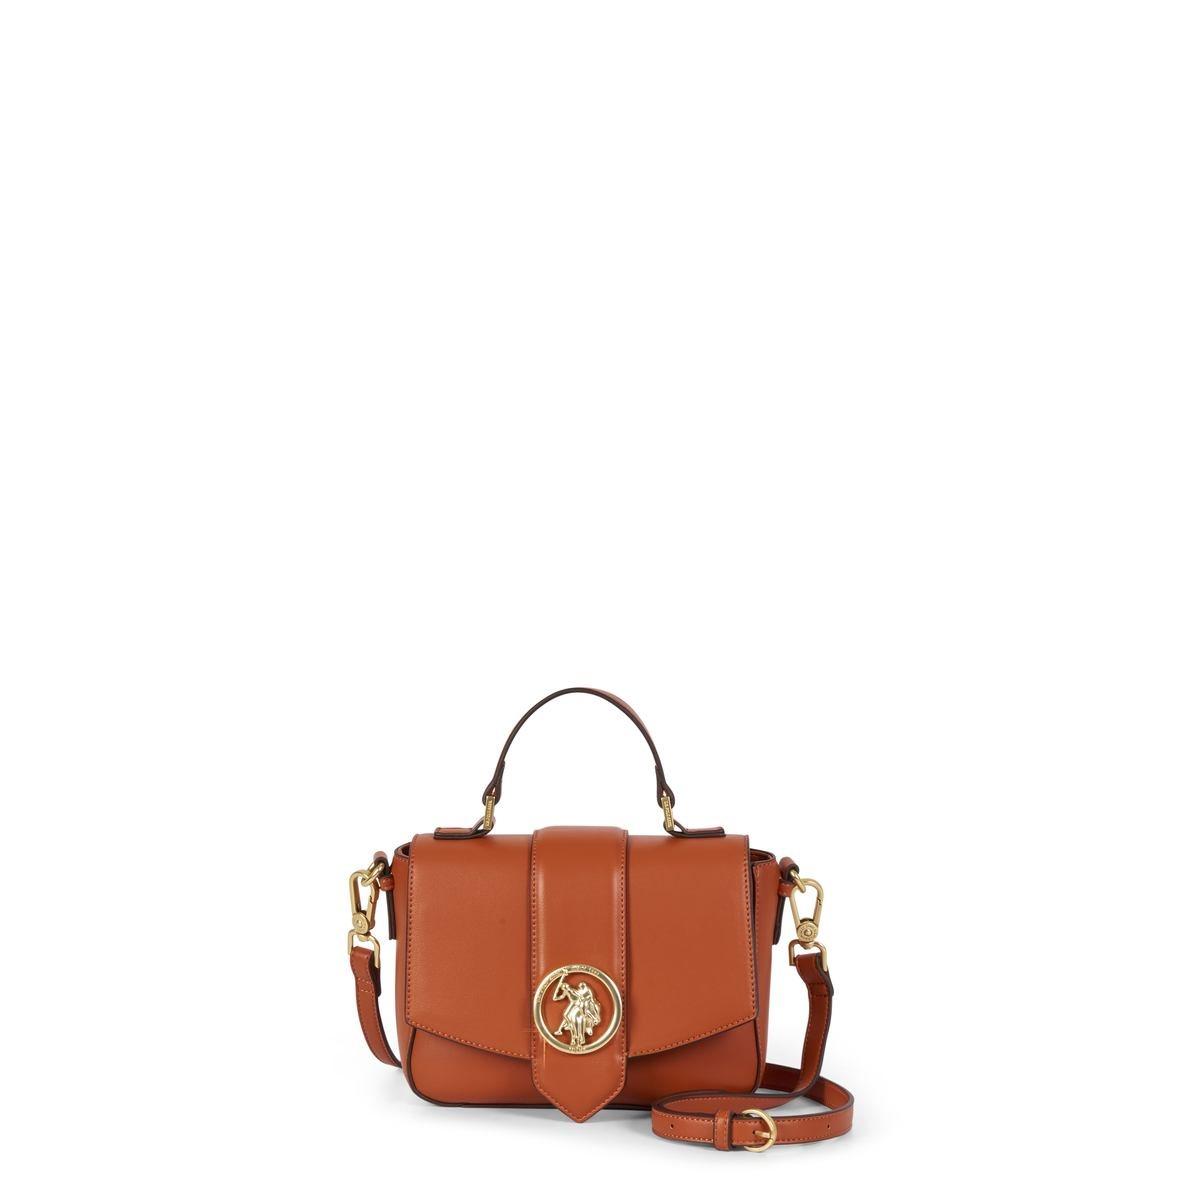 US Polo Assn. Τσάντα χειρός flap 20.5x7.5x14cm Vancouver Tan